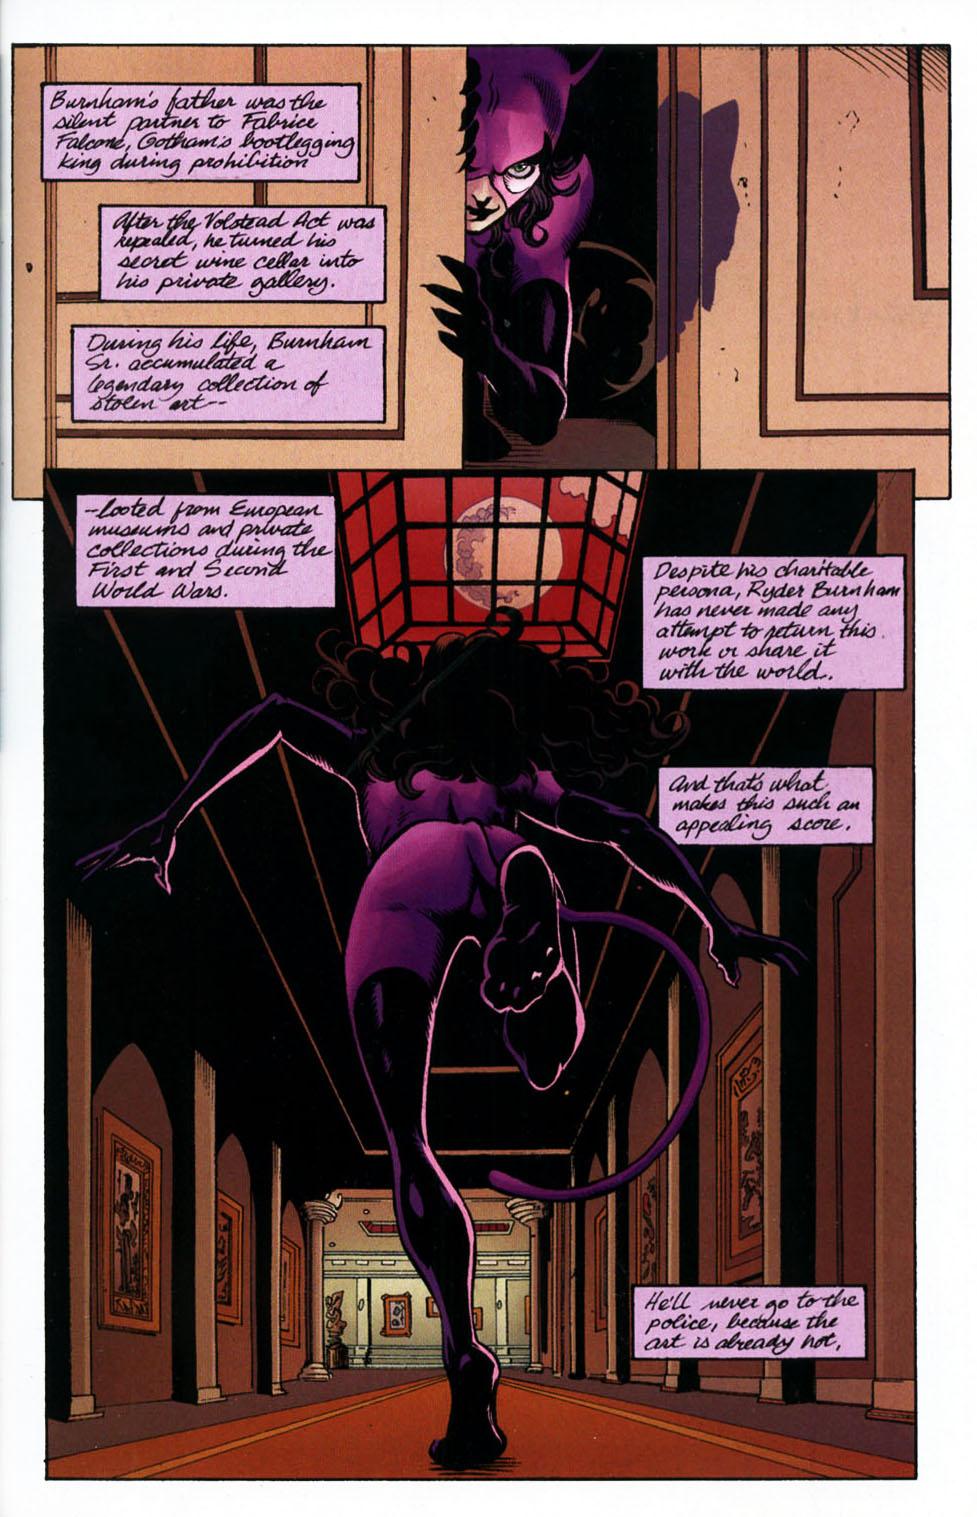 Birds Of Prey - Batgirl-Catwoman 1-17 Robbery.jpg